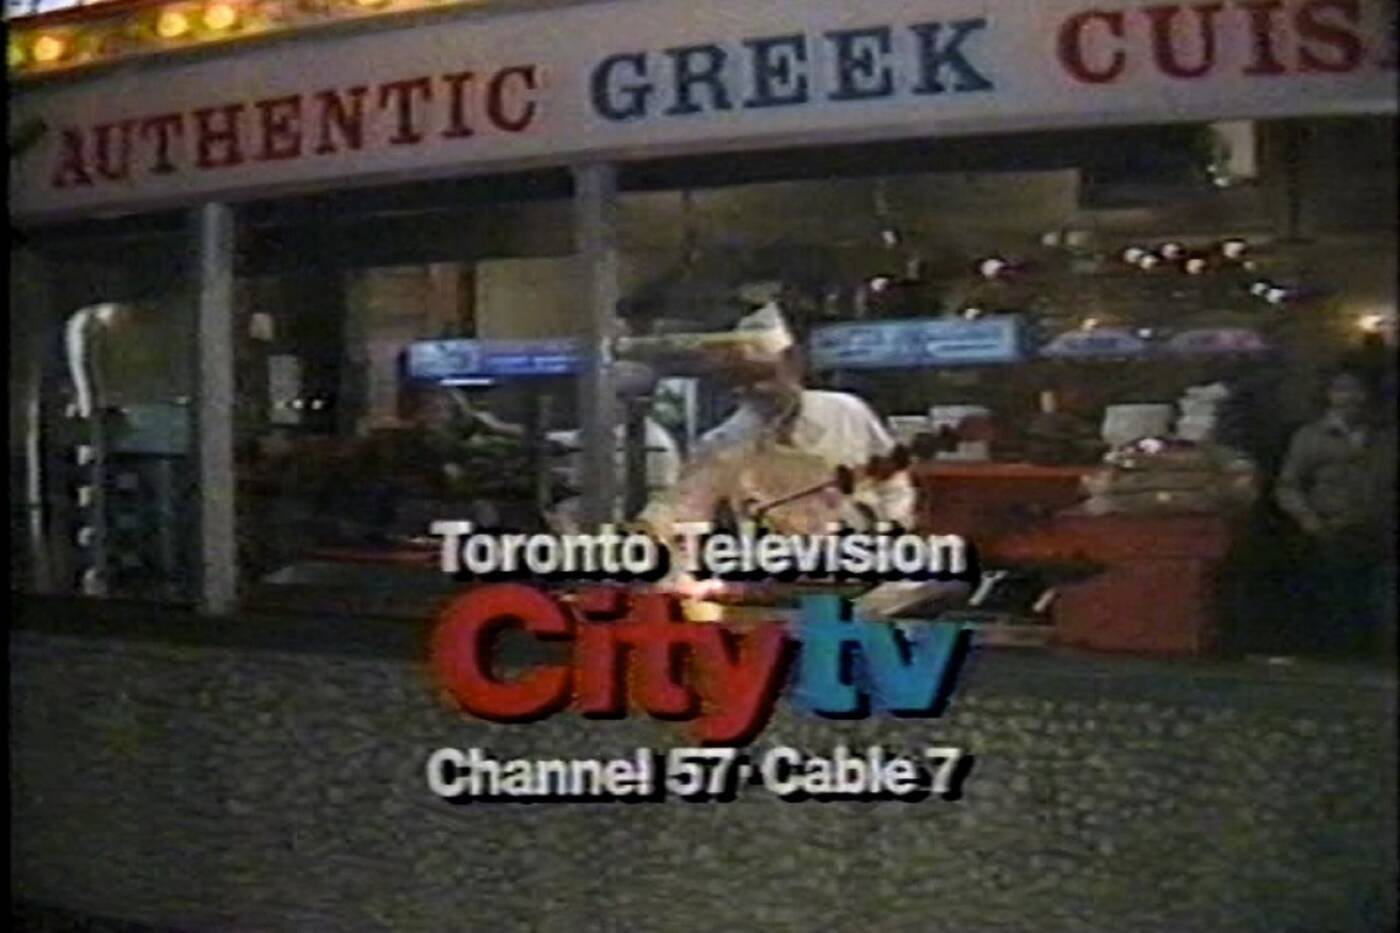 Toronto Trilogy Citytv